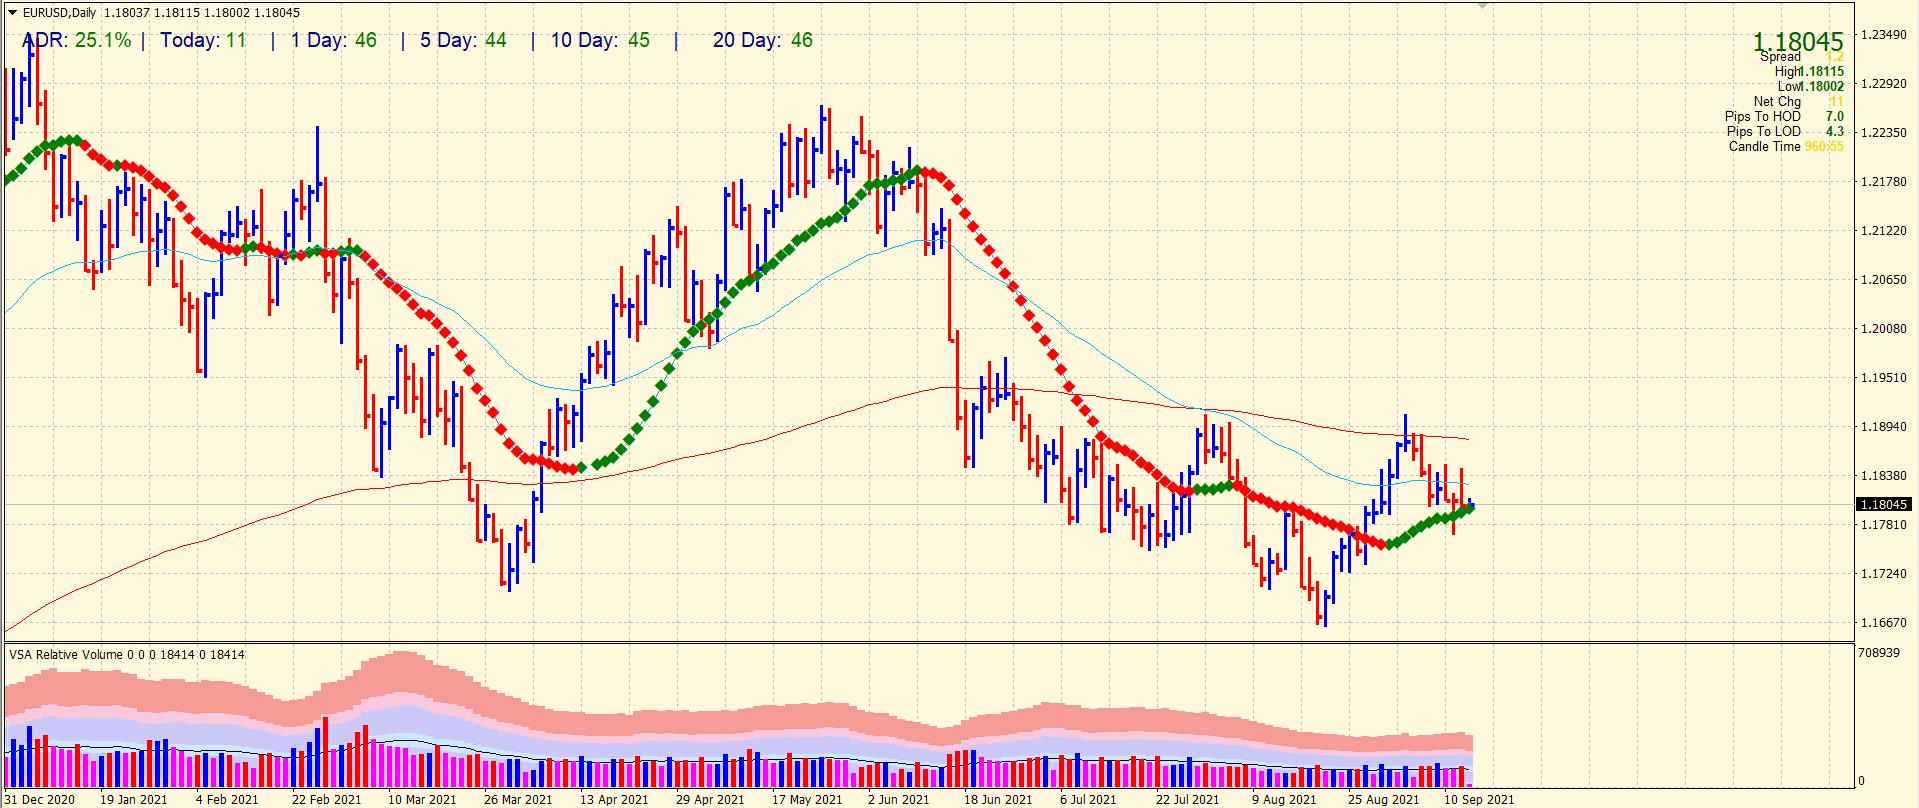 EUR/USD daily price chart analysis